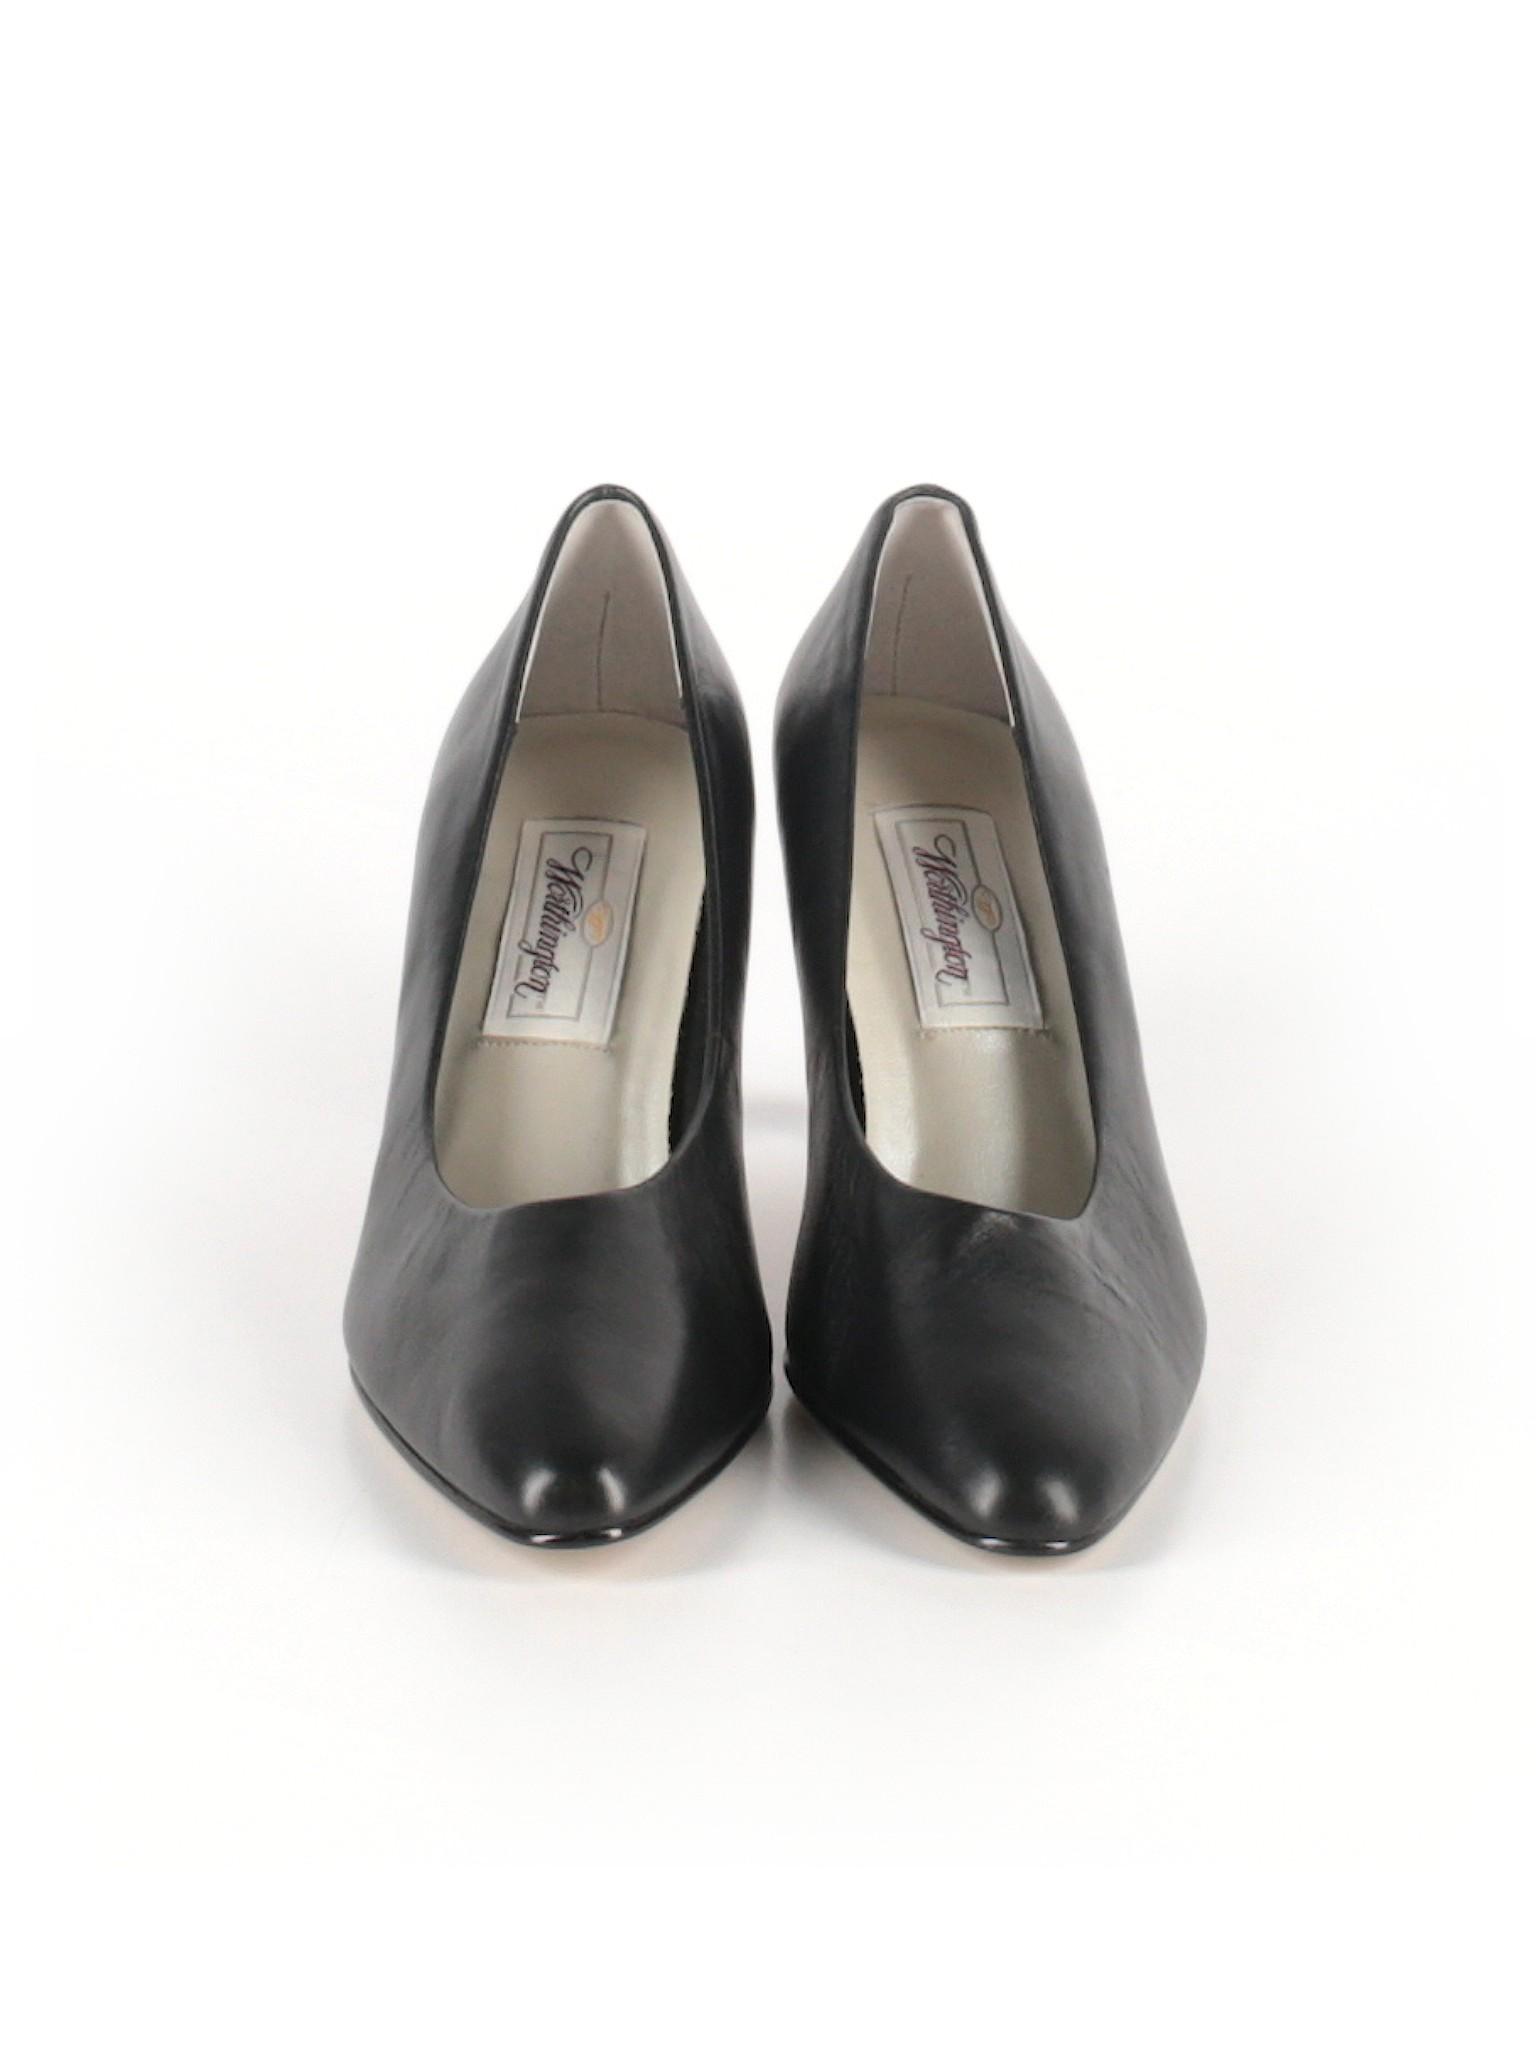 Worthington Heels promotion Boutique promotion Worthington Heels Boutique Boutique BEqPR1rEw